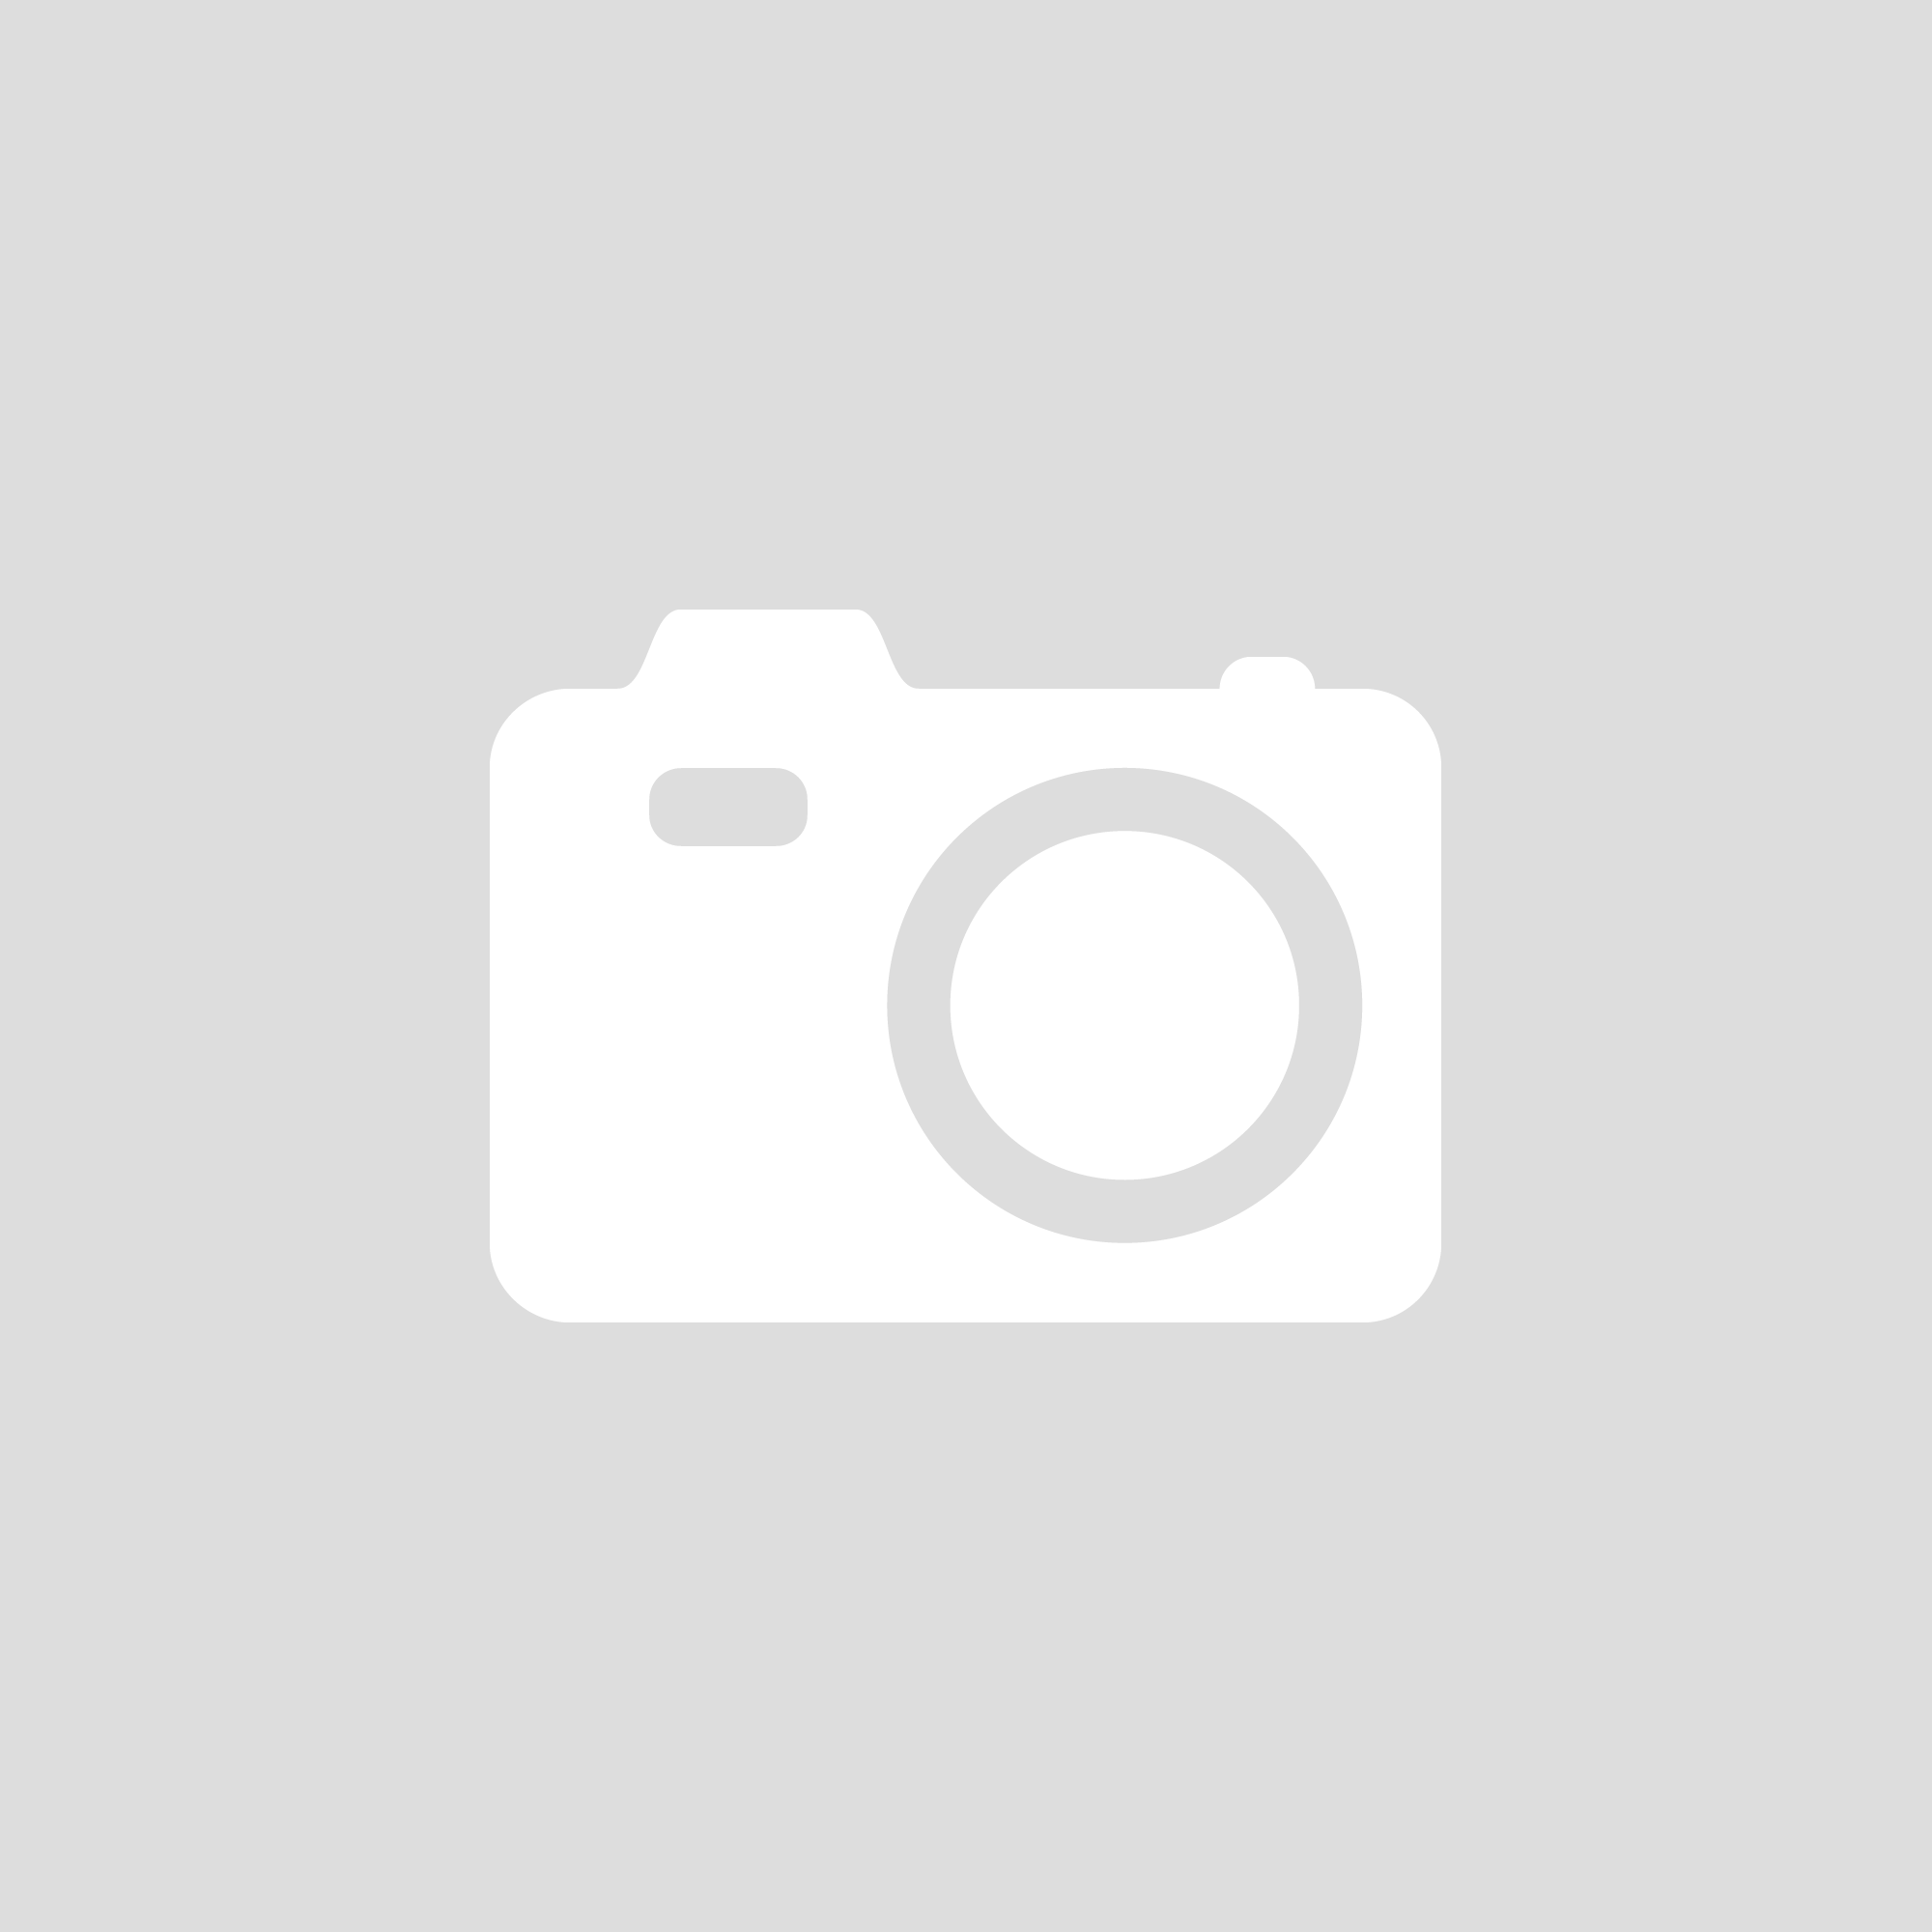 Lace Rose Plain Texture Warm Peach Wallpaper by Seriano GB 65008